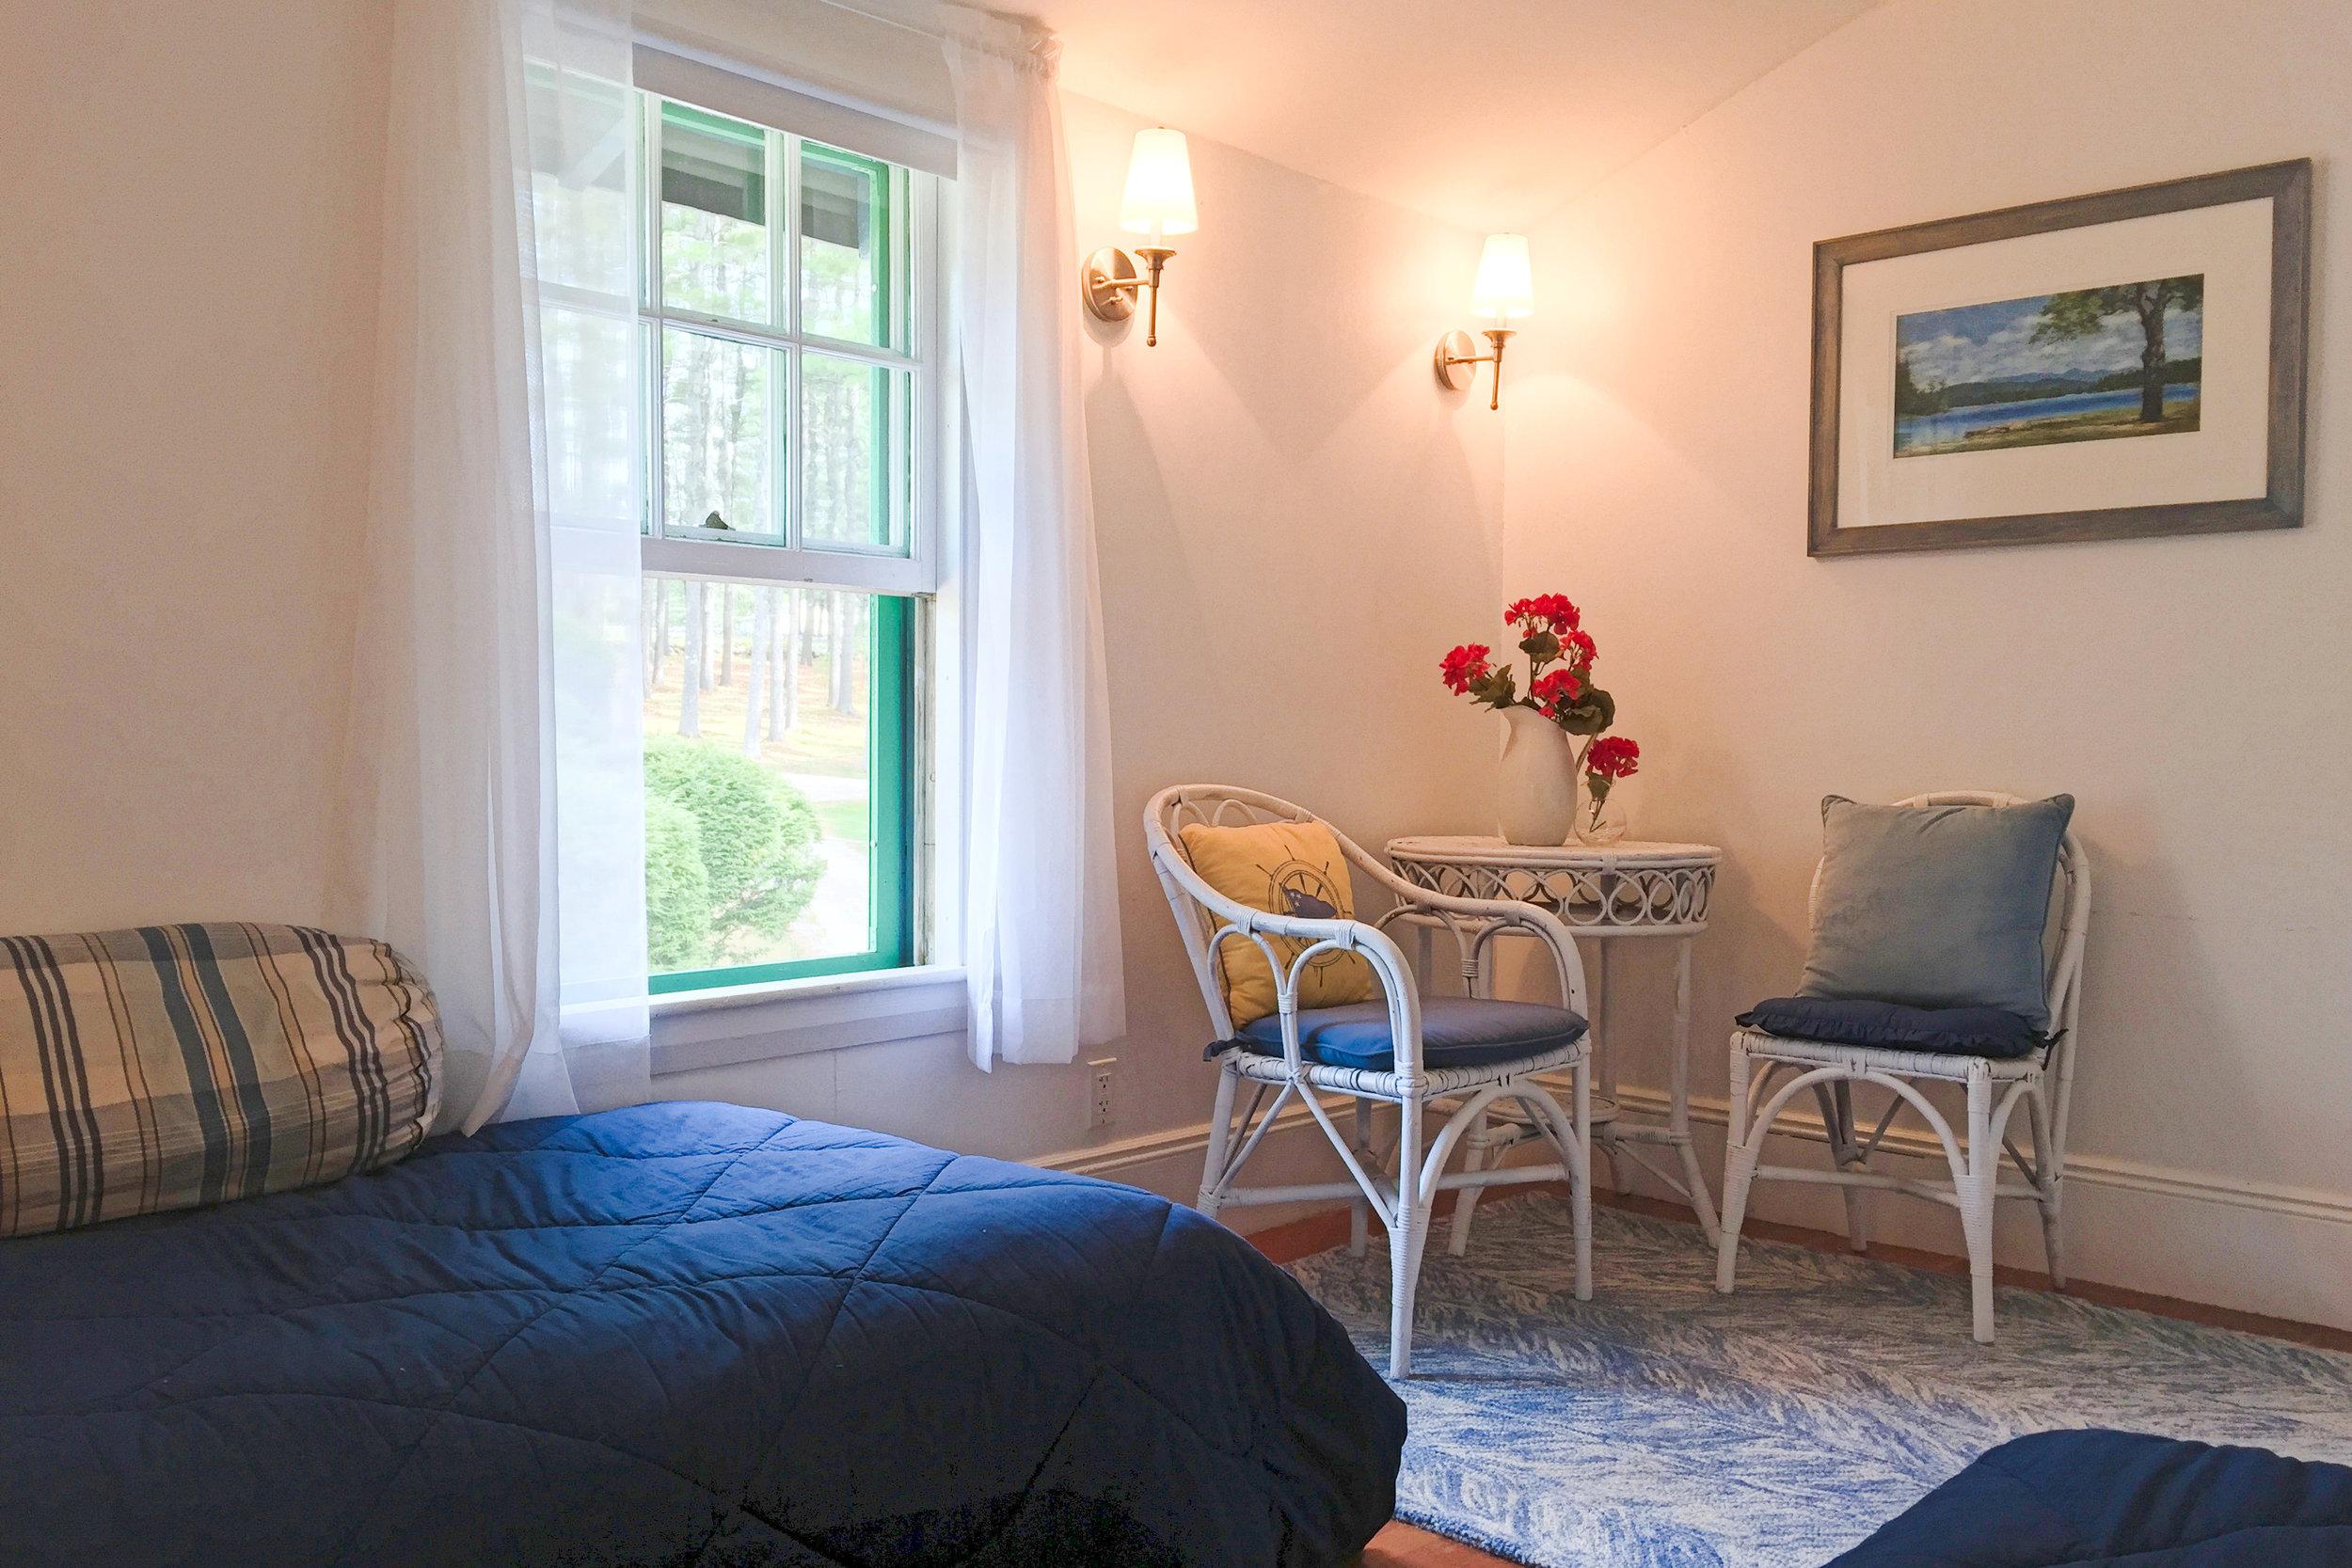 Southeast Bedroom Overlooks Landscaped Grounds